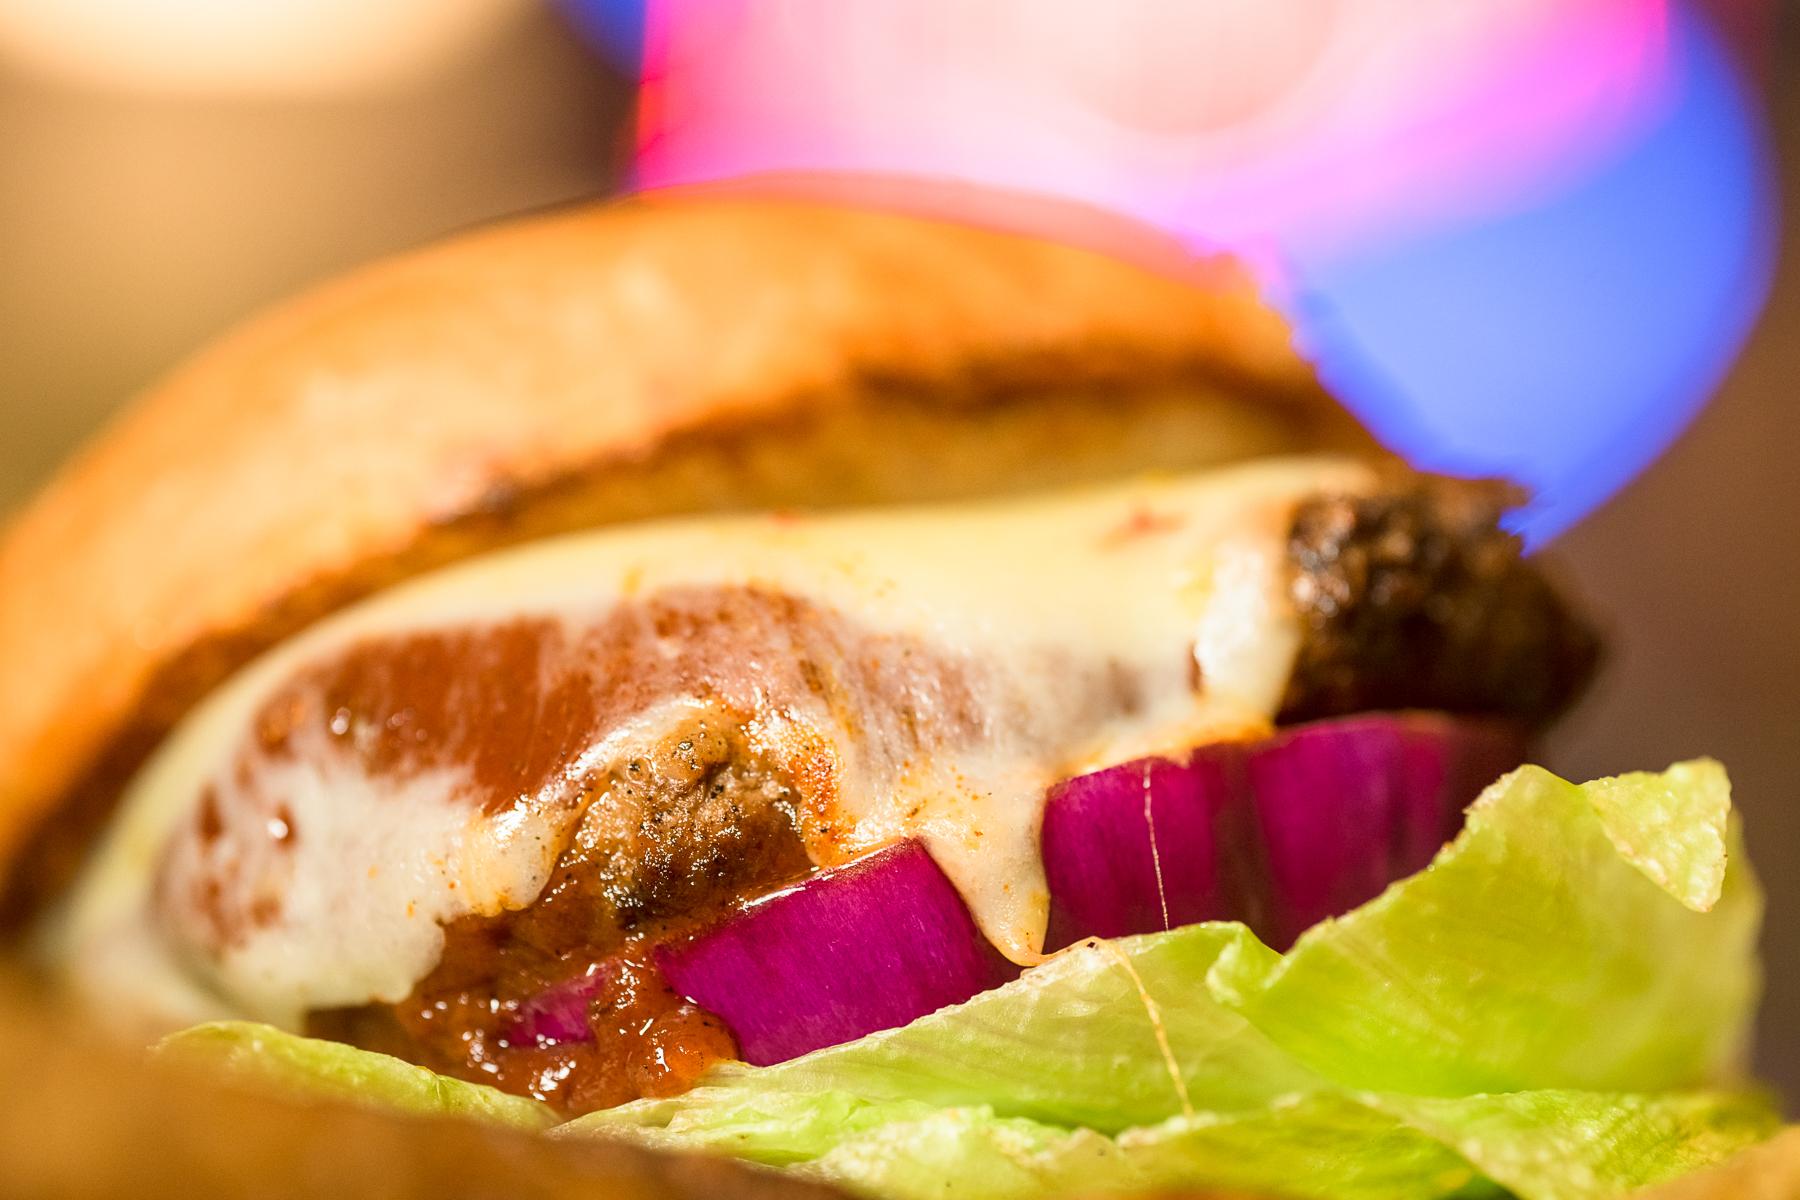 A7ii_20161020_7657, paul bellinger billings montana headshot photographer, burger dive fb.jpg